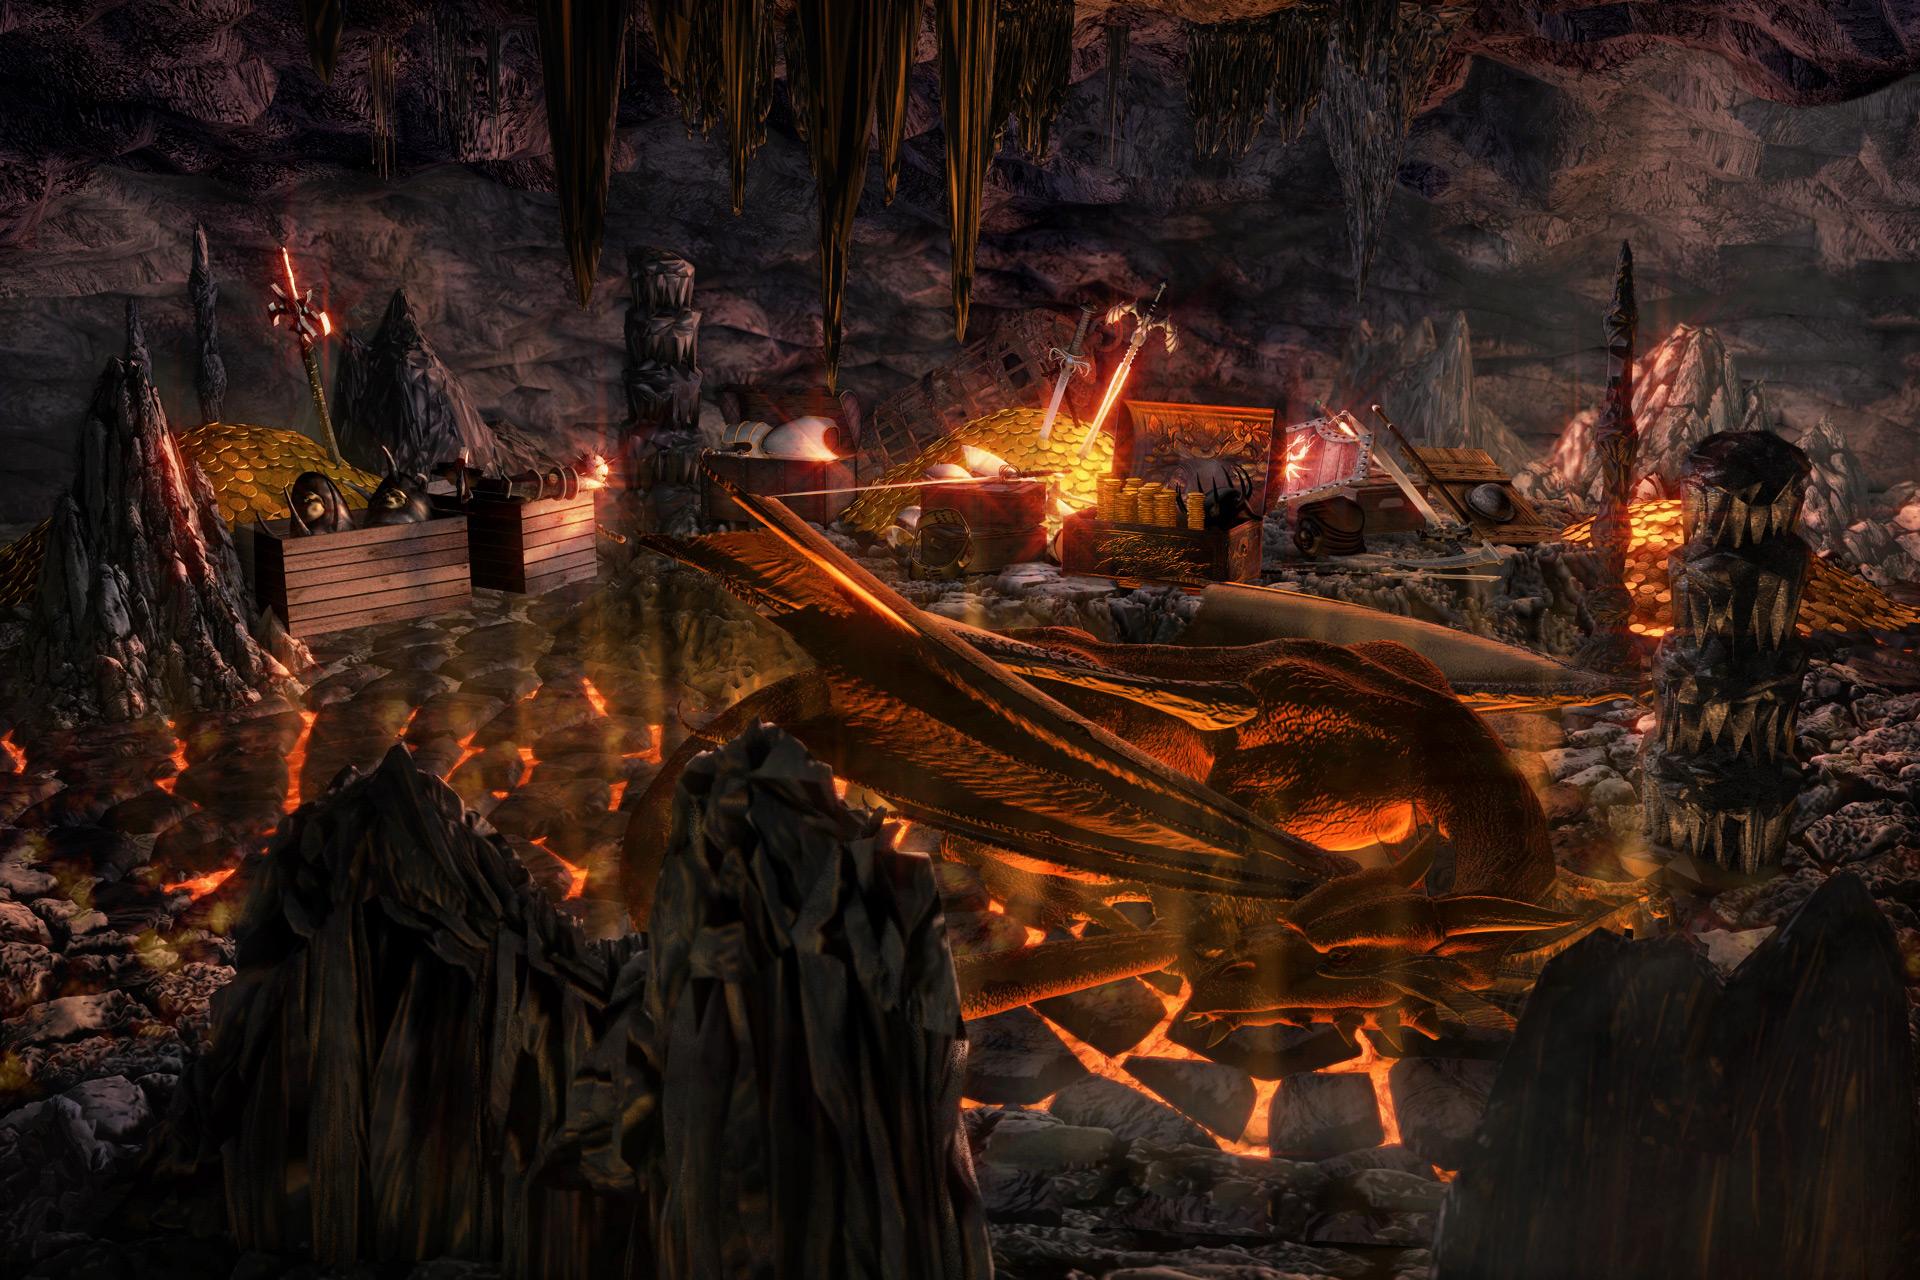 Dragon Dream by chaninja